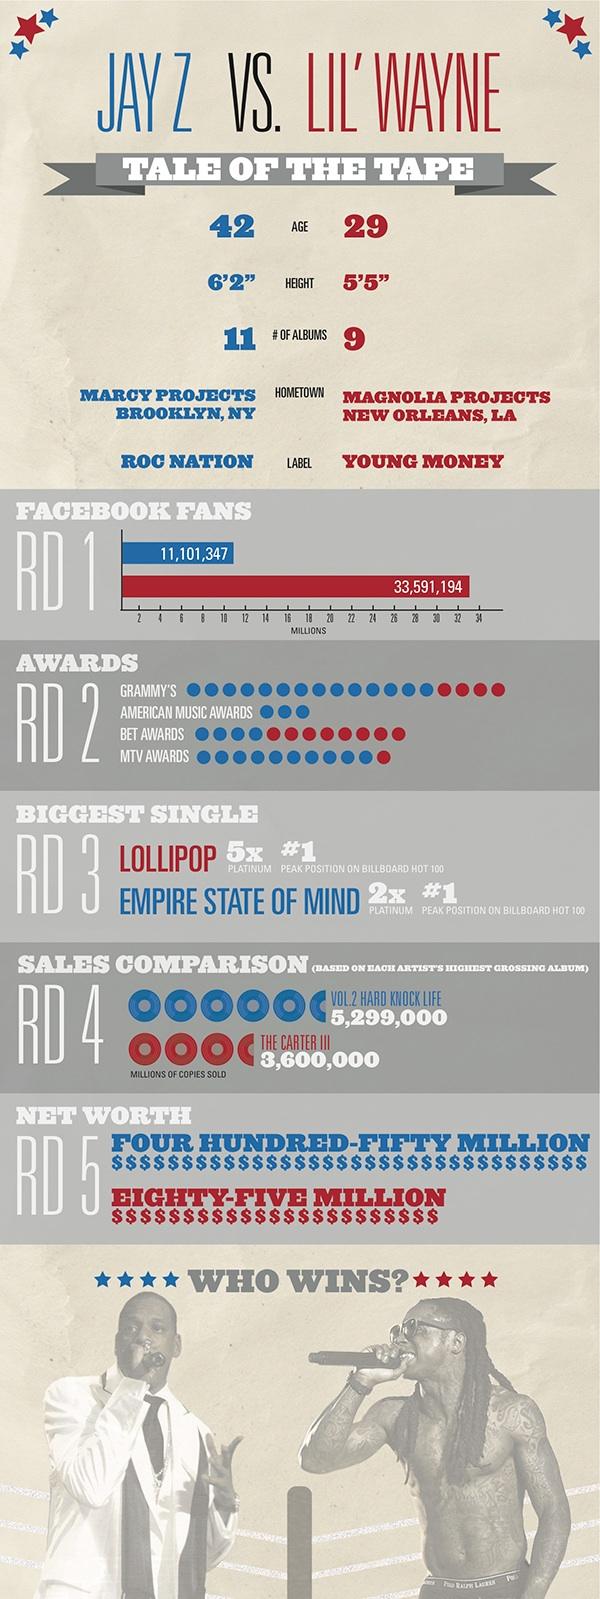 infographic Jay Z vs. Lil' Wayne